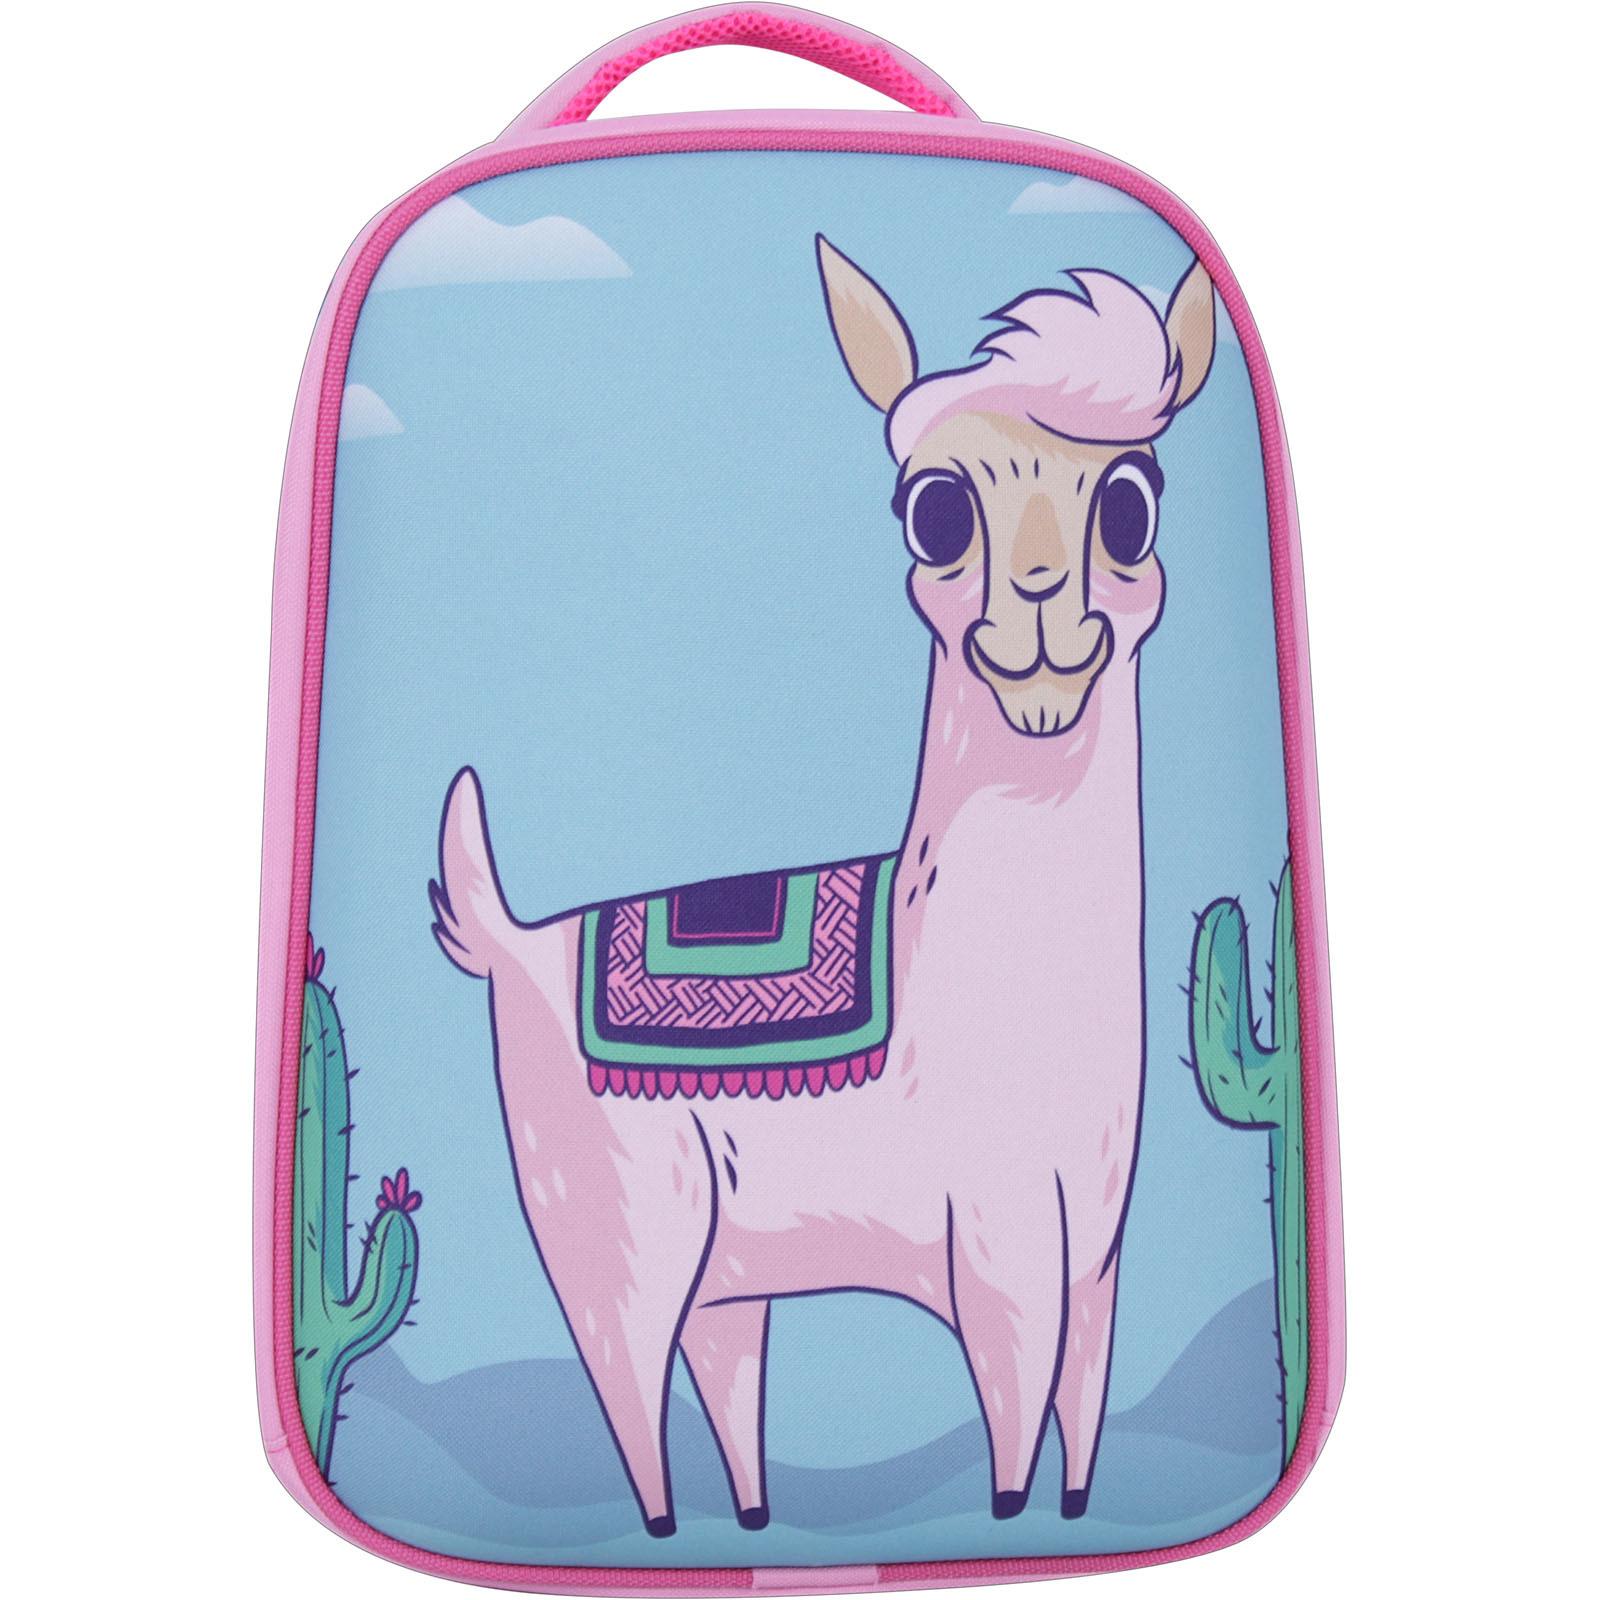 Школьные рюкзаки Рюкзак Bagland Turtle 17 л. розовый 617 (0013466) IMG_2247_суб.617_-1600.jpg